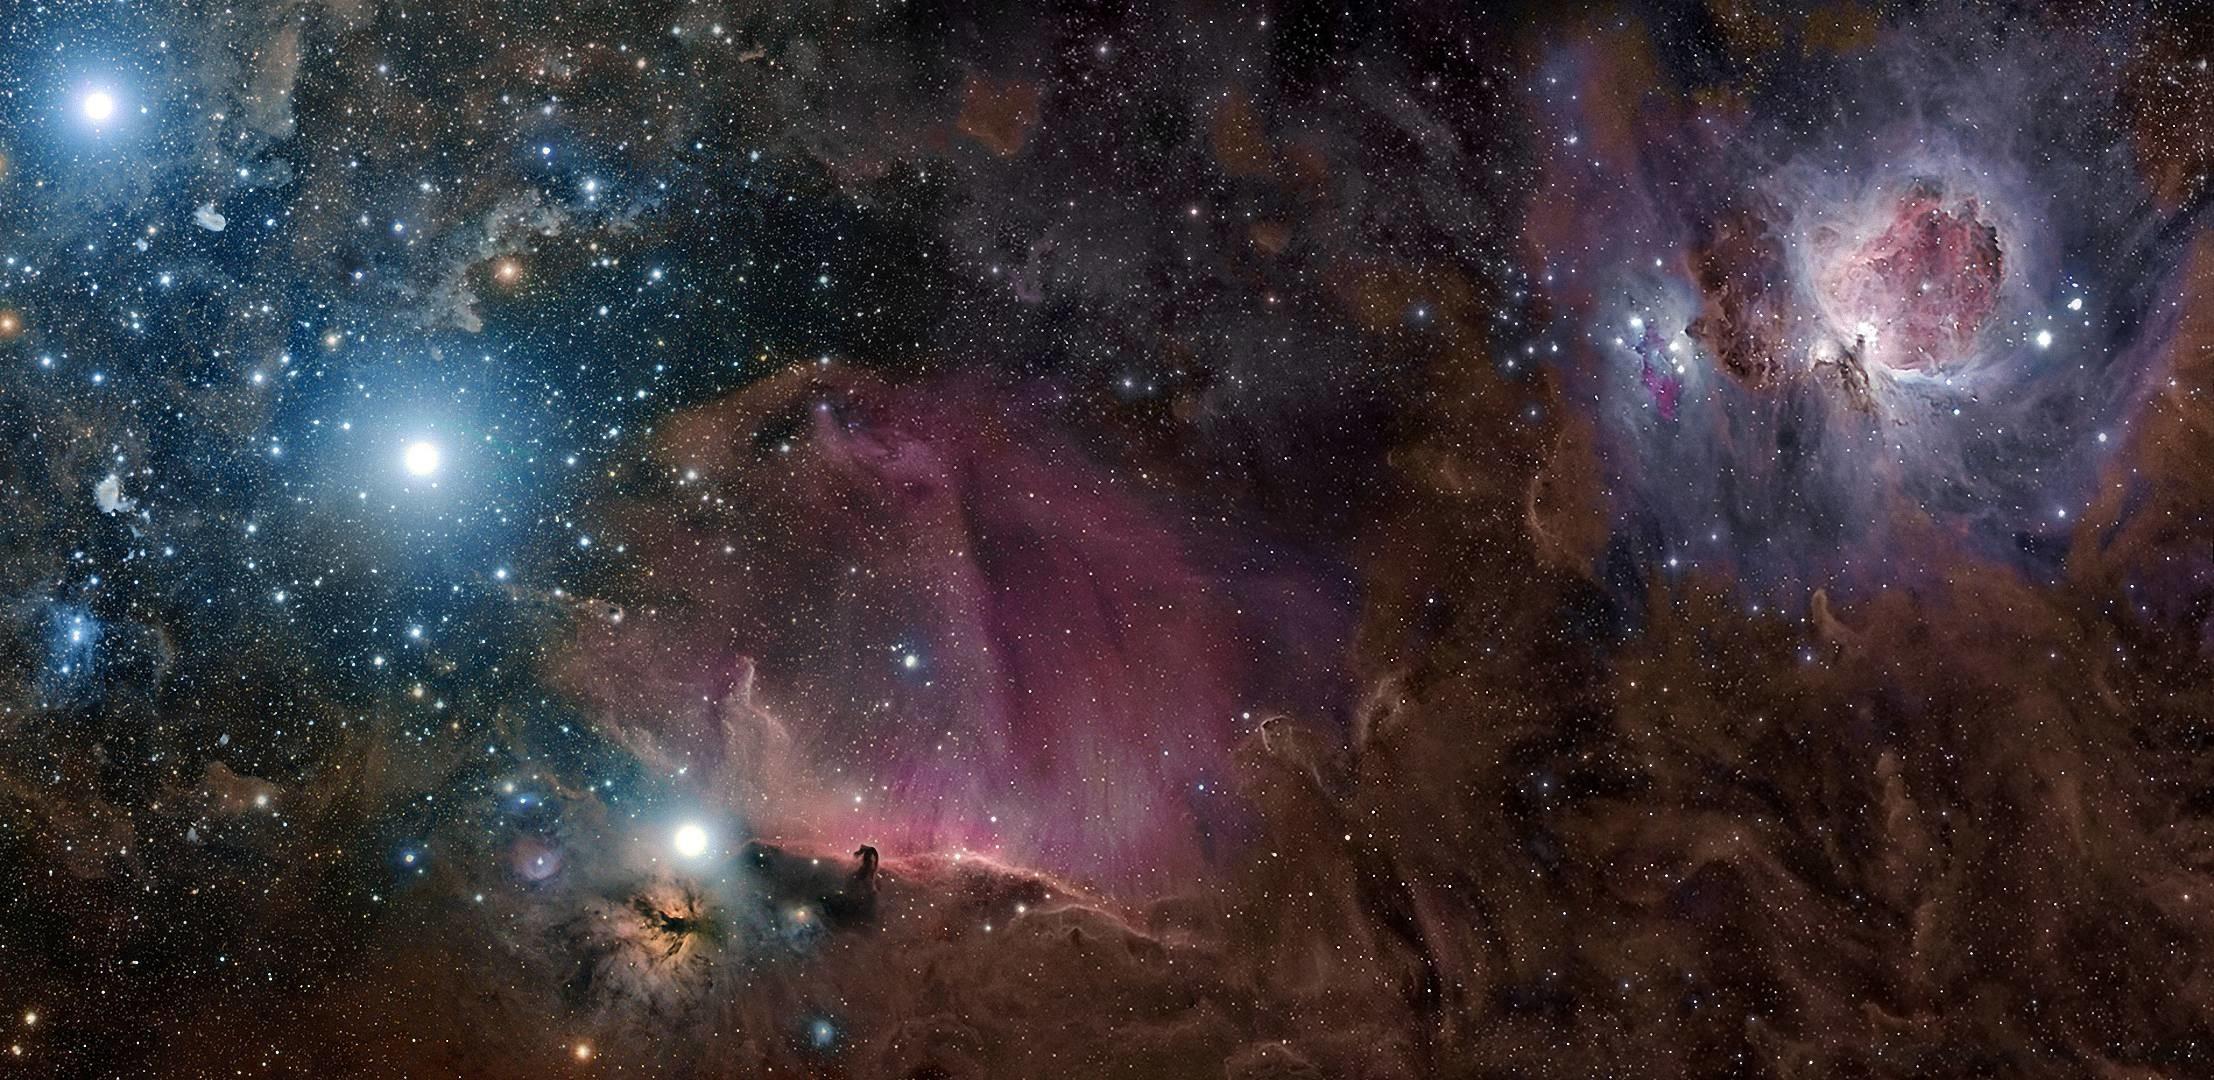 Download wallpaper Orion, constellation, nebula, gas free desktop .